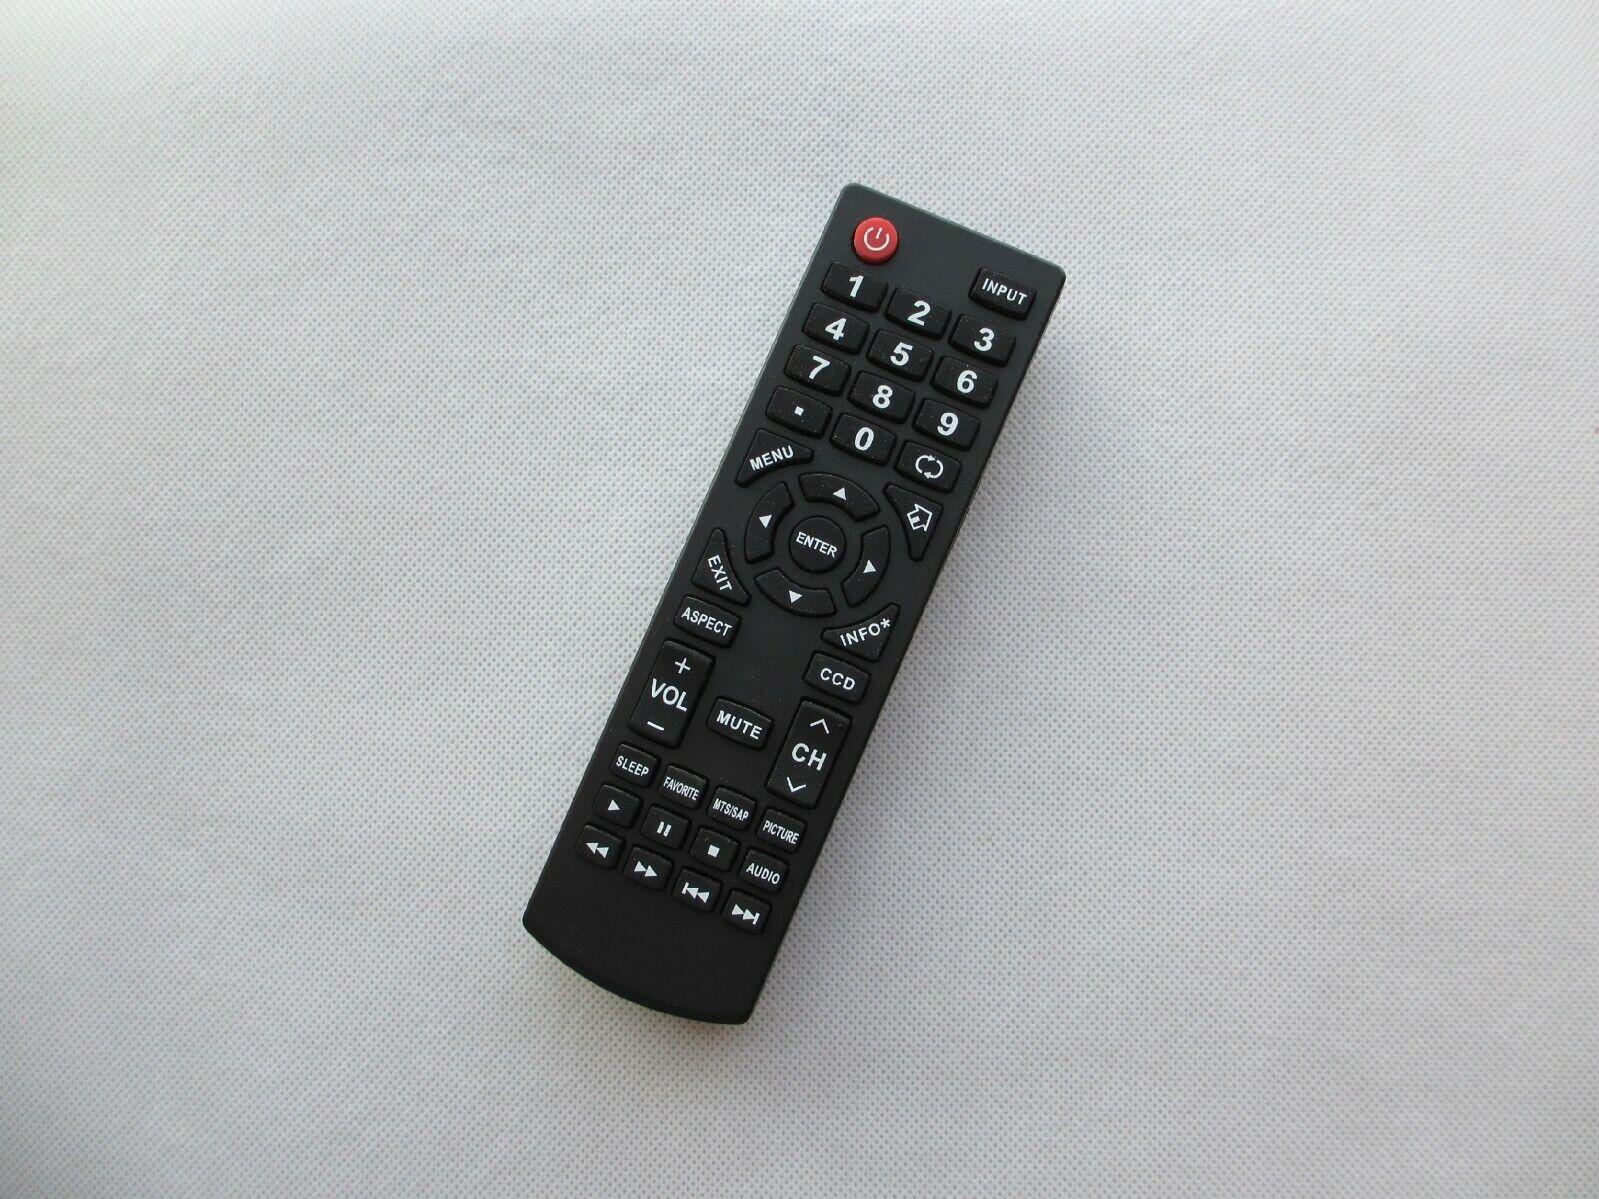 Dynex Rc Vk09 V1 Lcd Tv Remote Control Dxl32110a Dx L321 10a For Sale Online Ebay